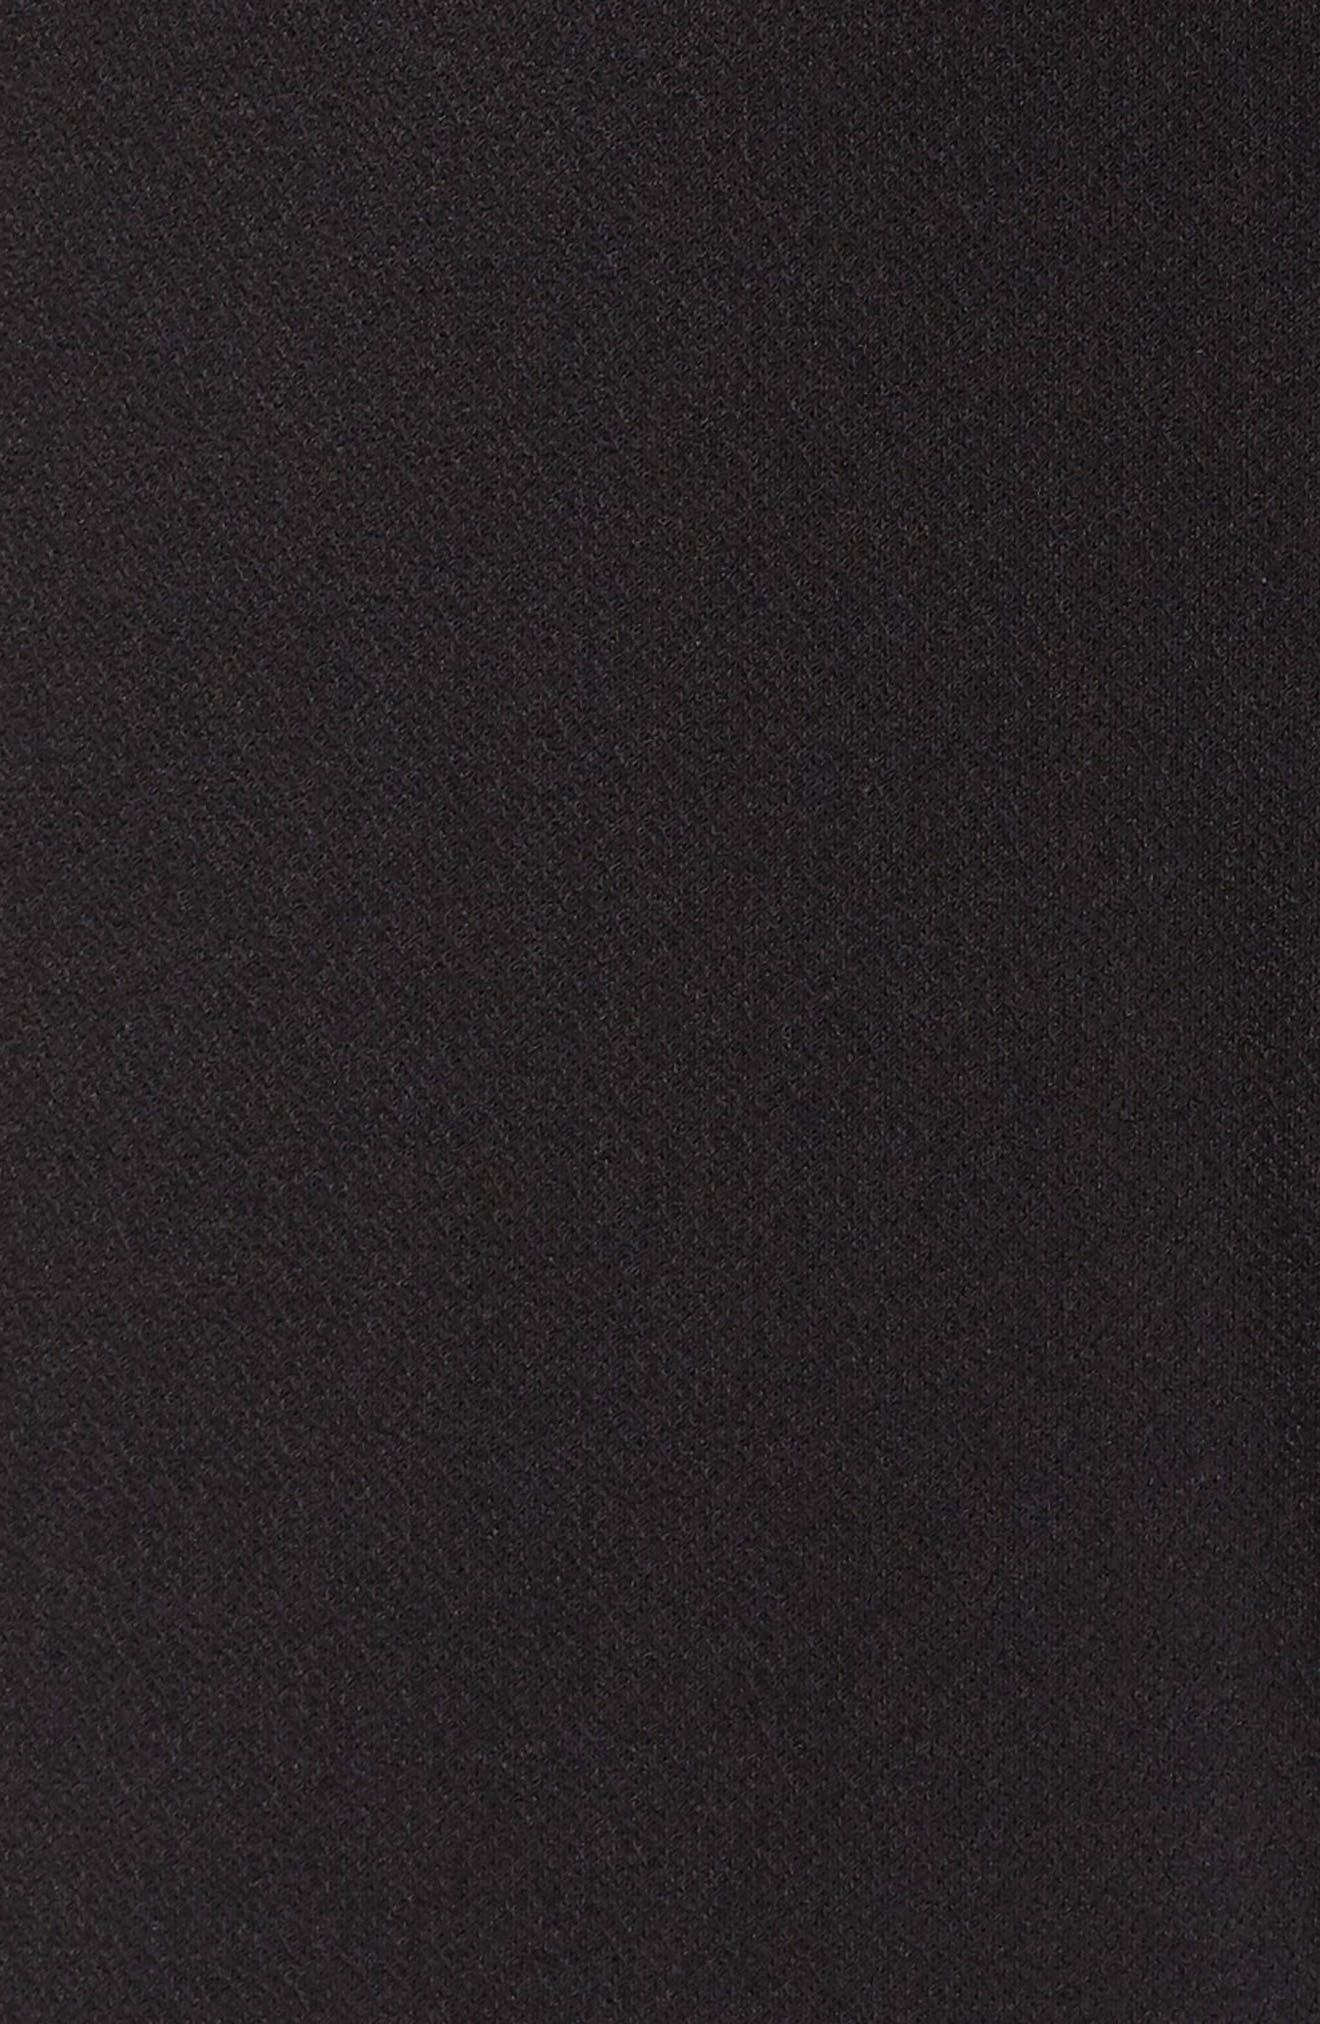 Tiered Ruffle Sleeve Crepe Jumpsuit,                             Alternate thumbnail 5, color,                             Black